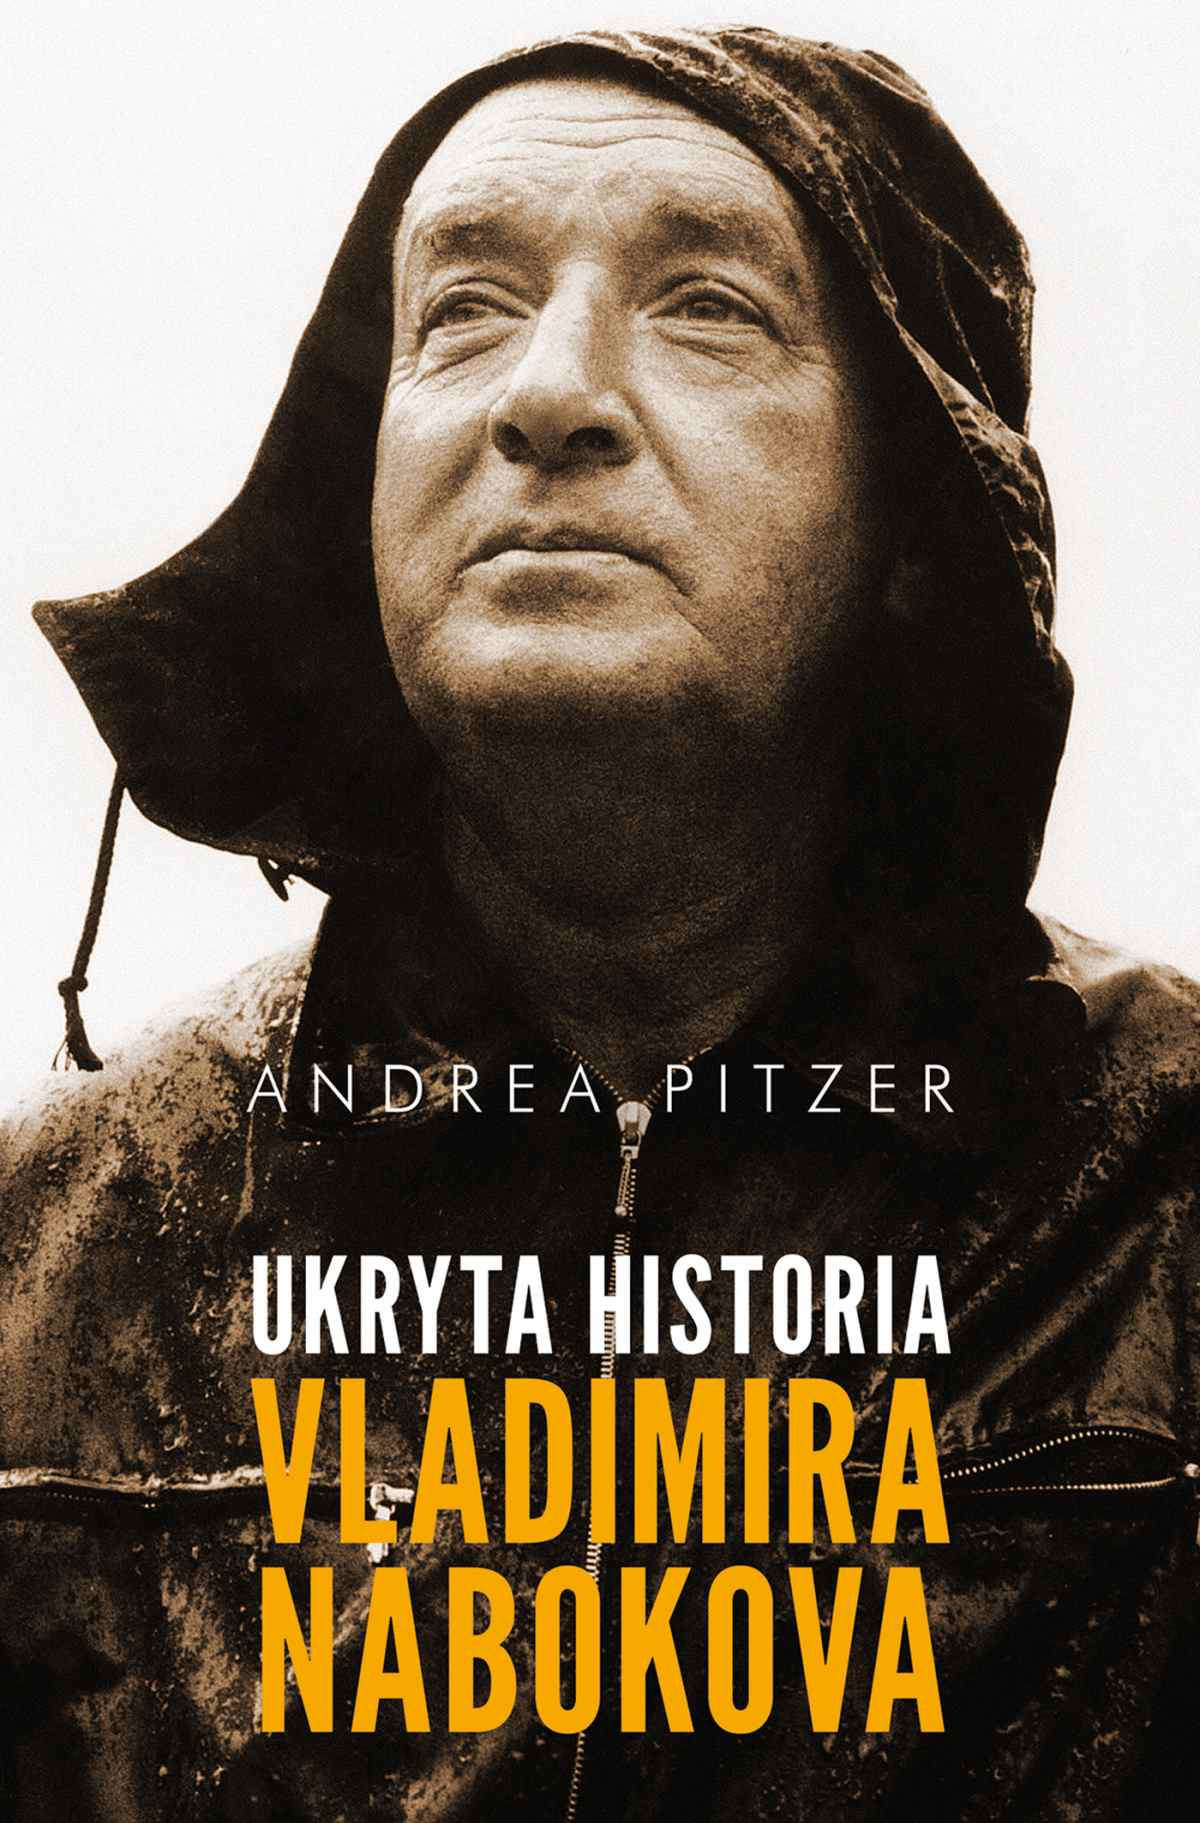 Ukryta historia Vladimira Nabokova - Ebook (Książka EPUB) do pobrania w formacie EPUB